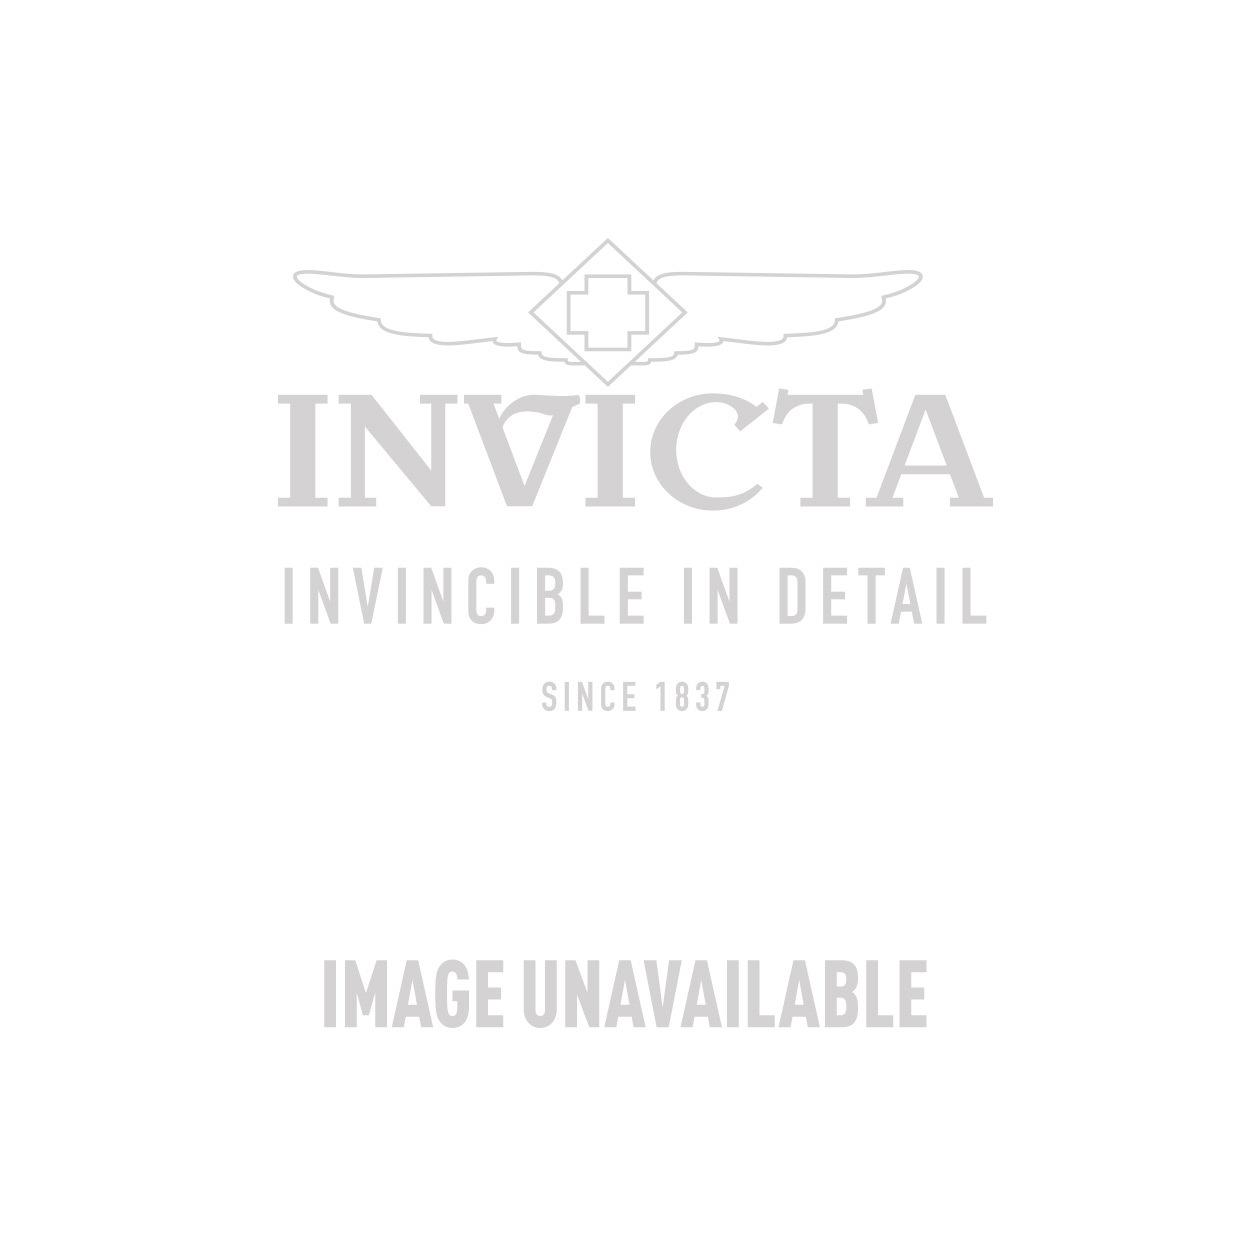 Invicta Specialty Swiss Movement Quartz Watch - Tungsten case Stainless Steel band - Model 0368